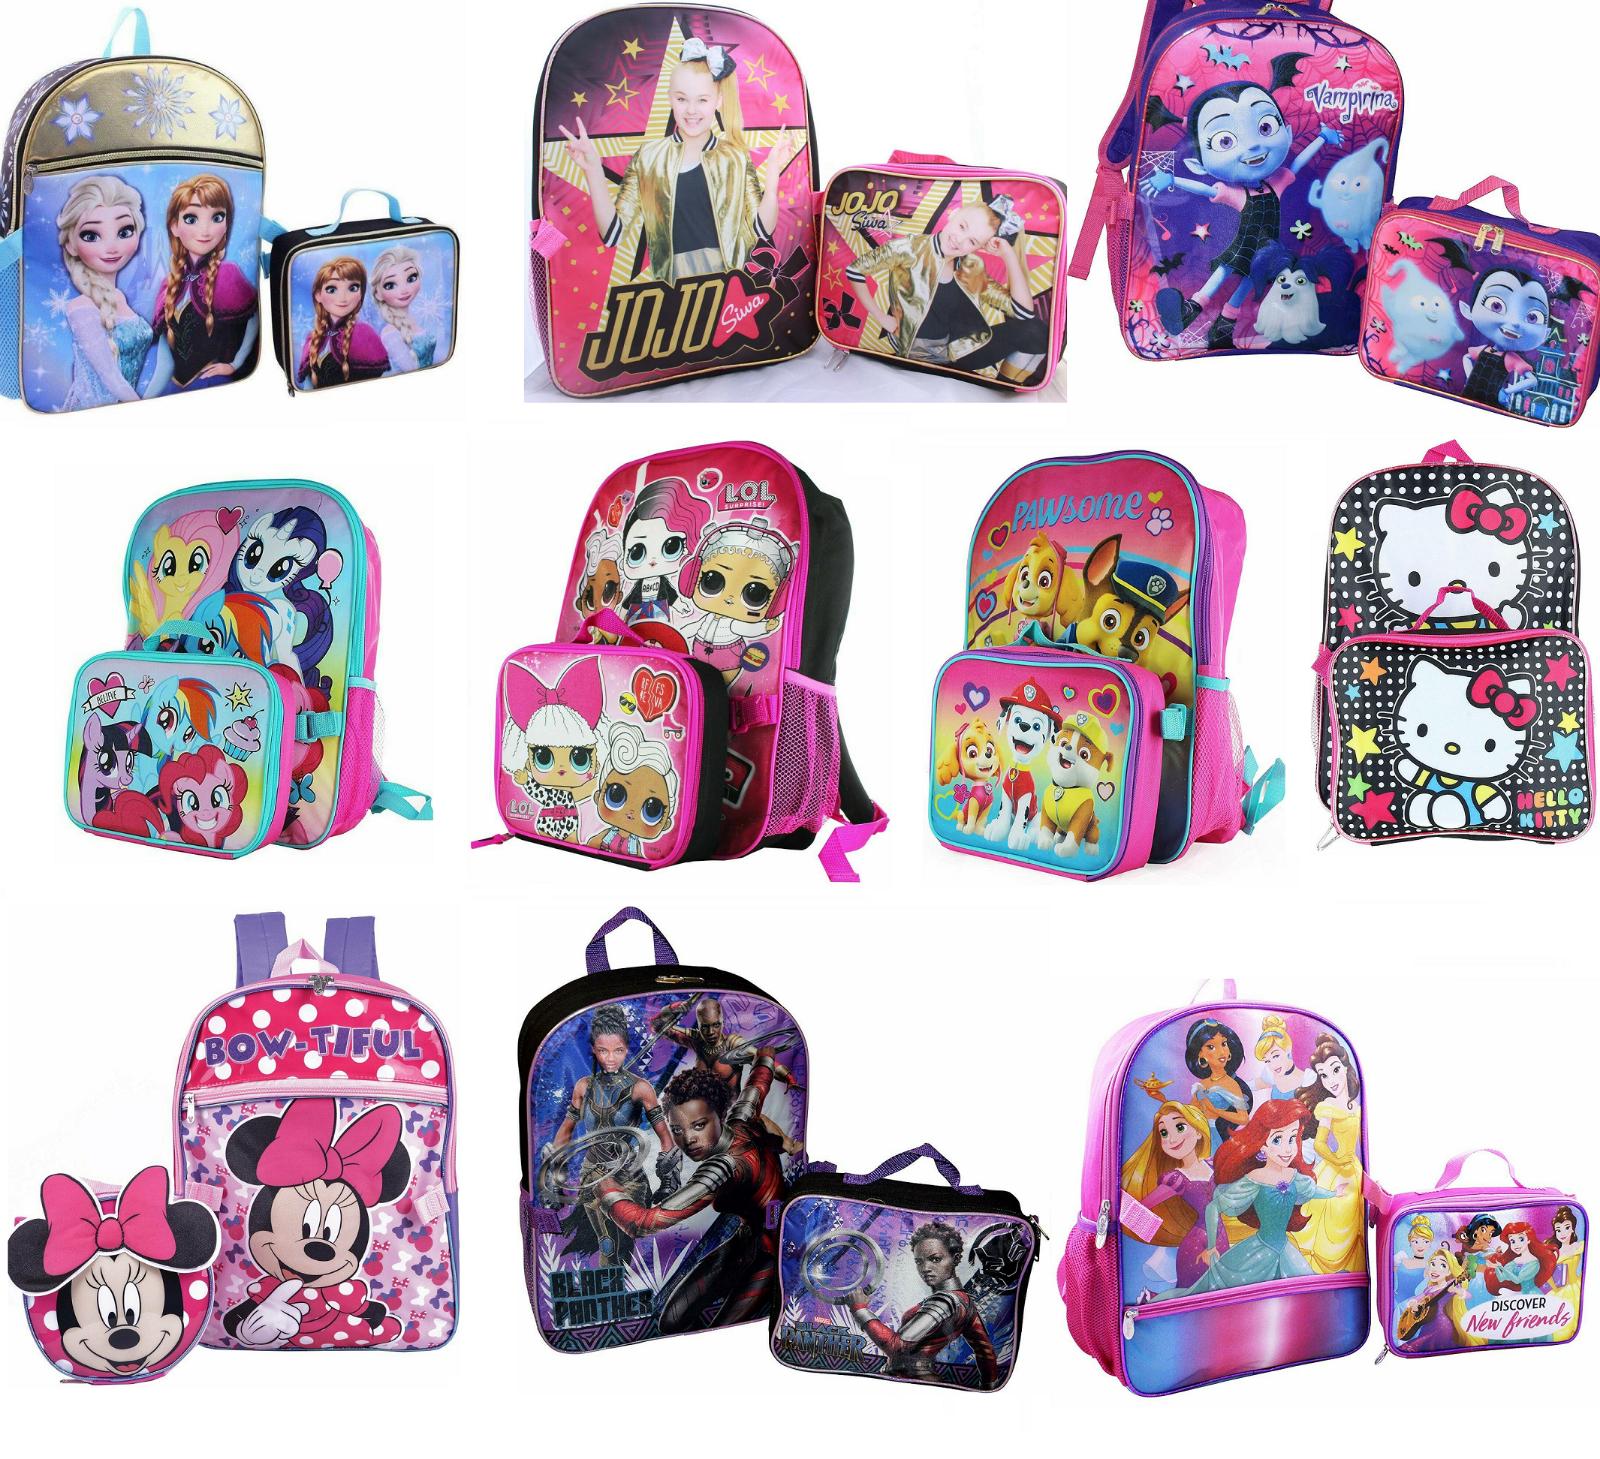 little girls school backpack lunch box set